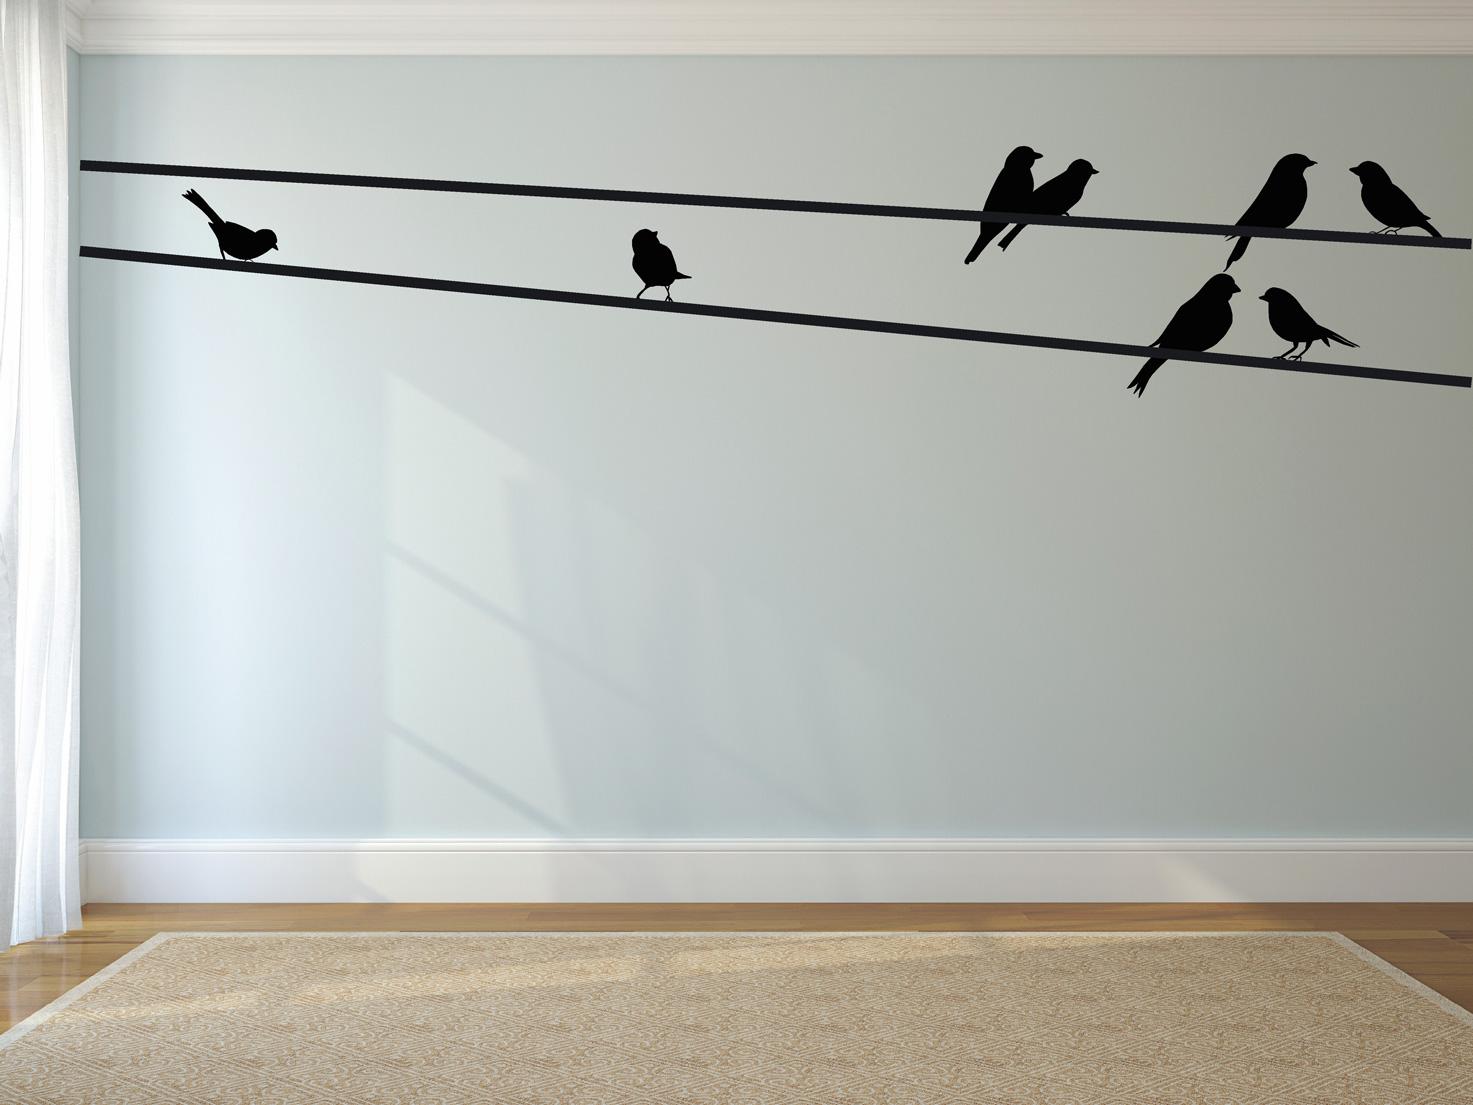 muurstickers c vogels groot muursticker zwart